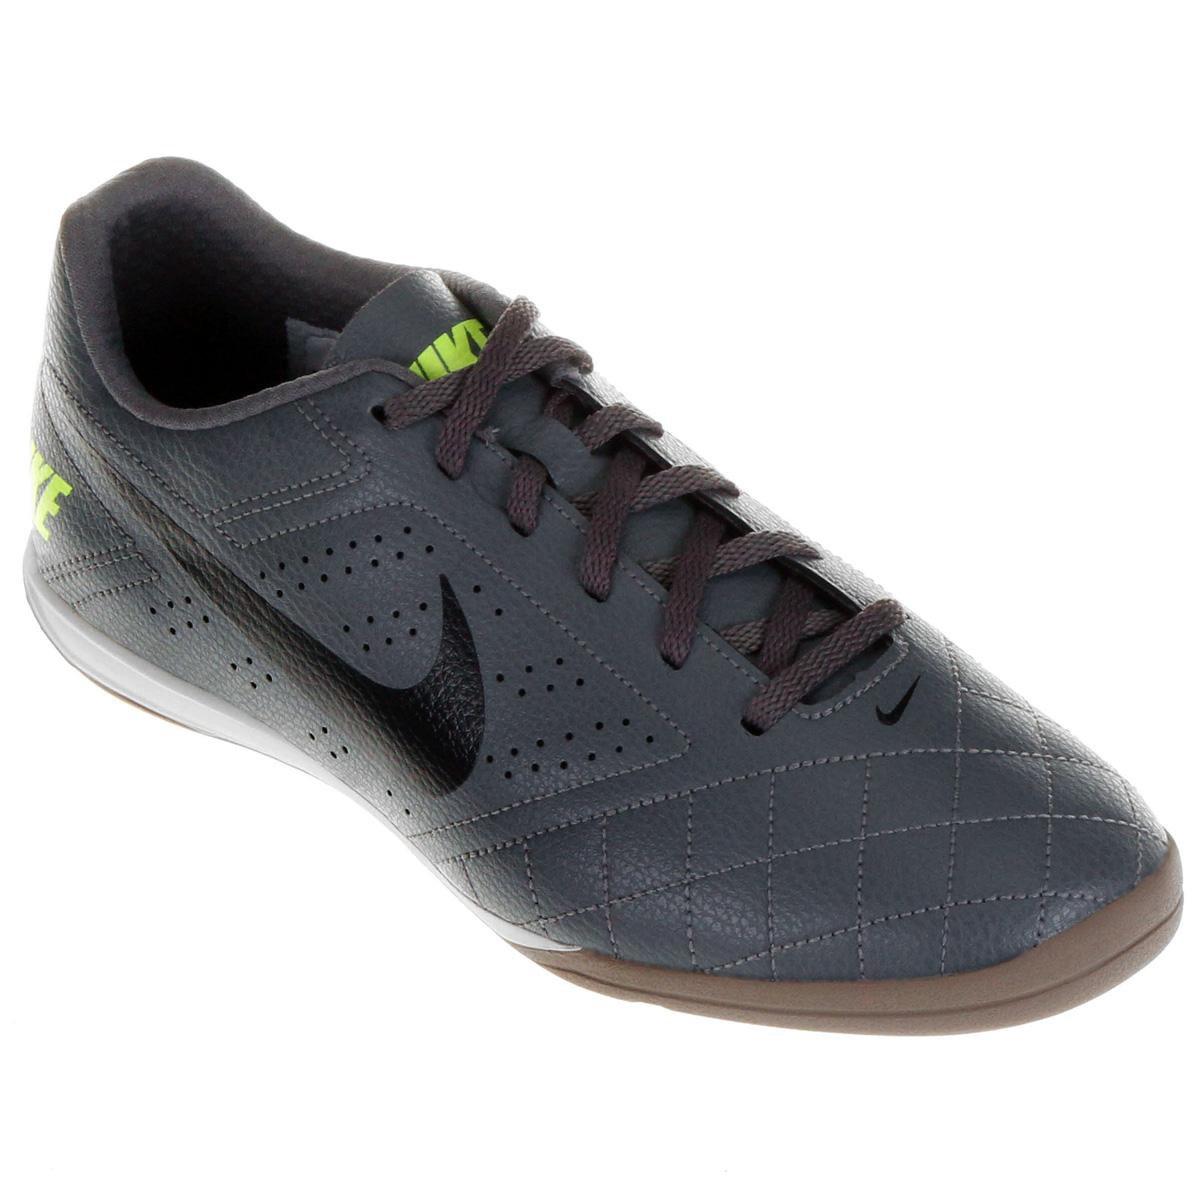 712cec6075542 Chuteira Futsal Nike Beco 2 Futsal - Chumbo - Compre Agora